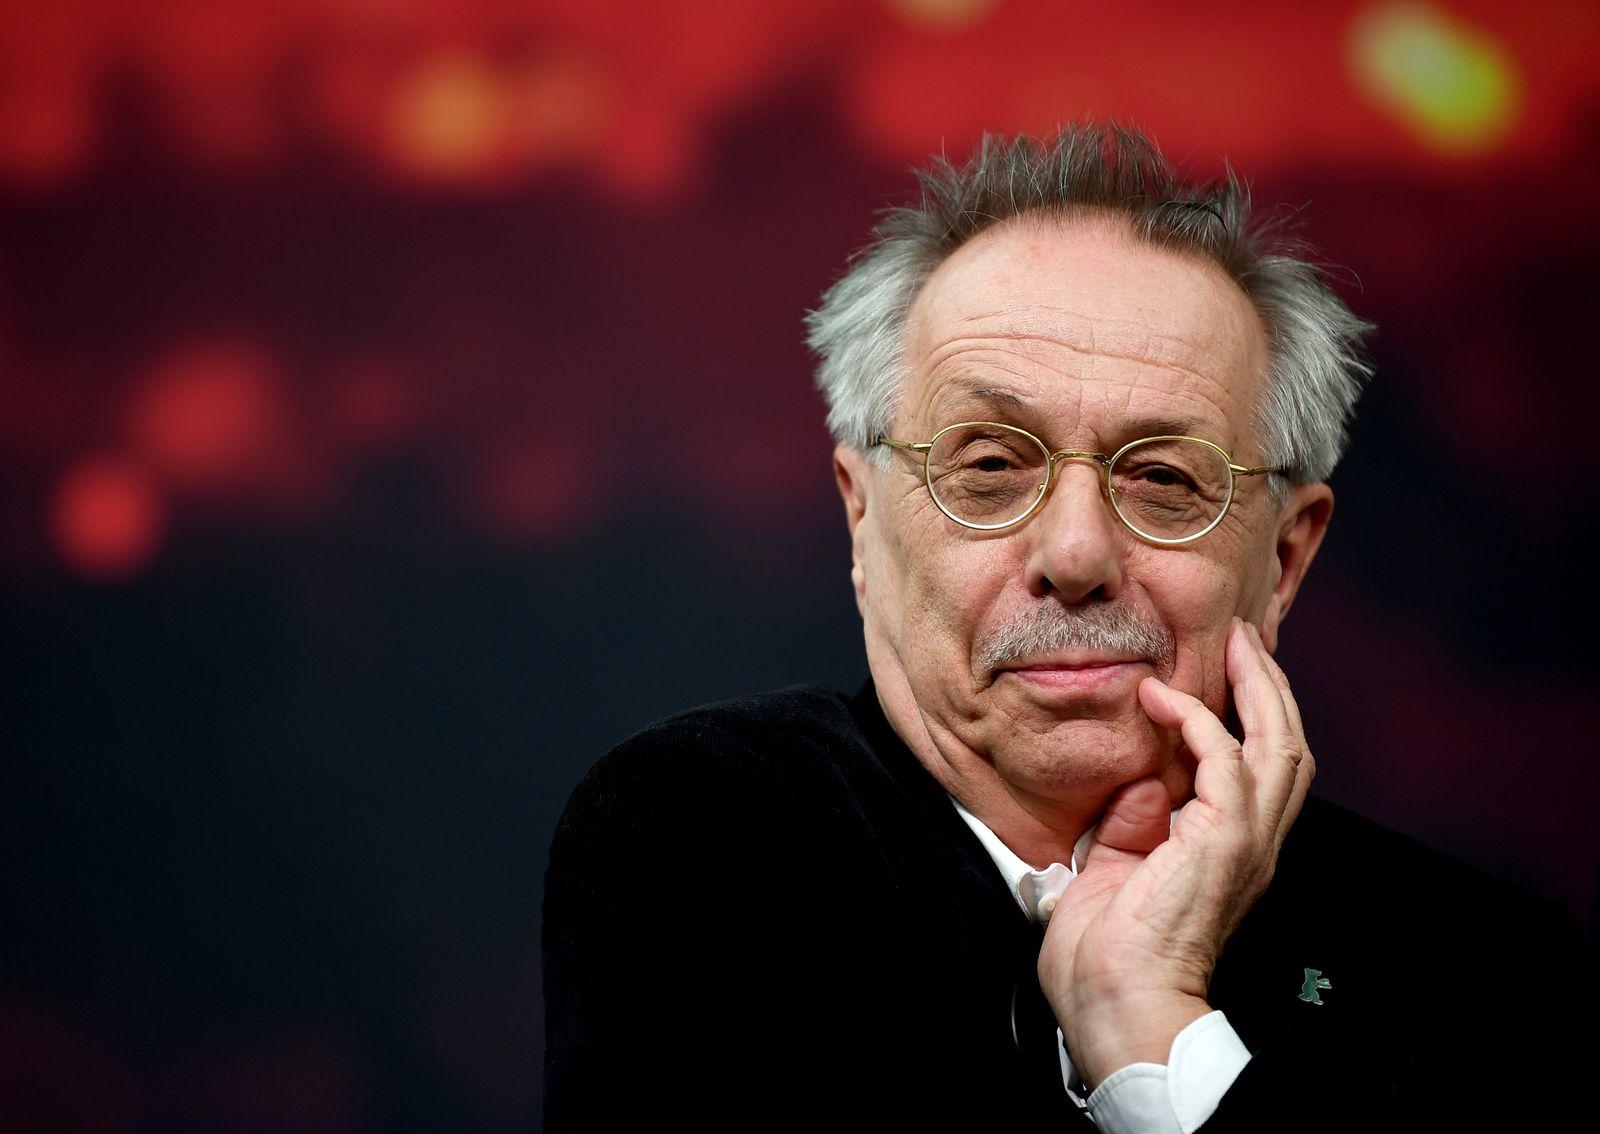 Berlinale-Chef Dieter Kosslick